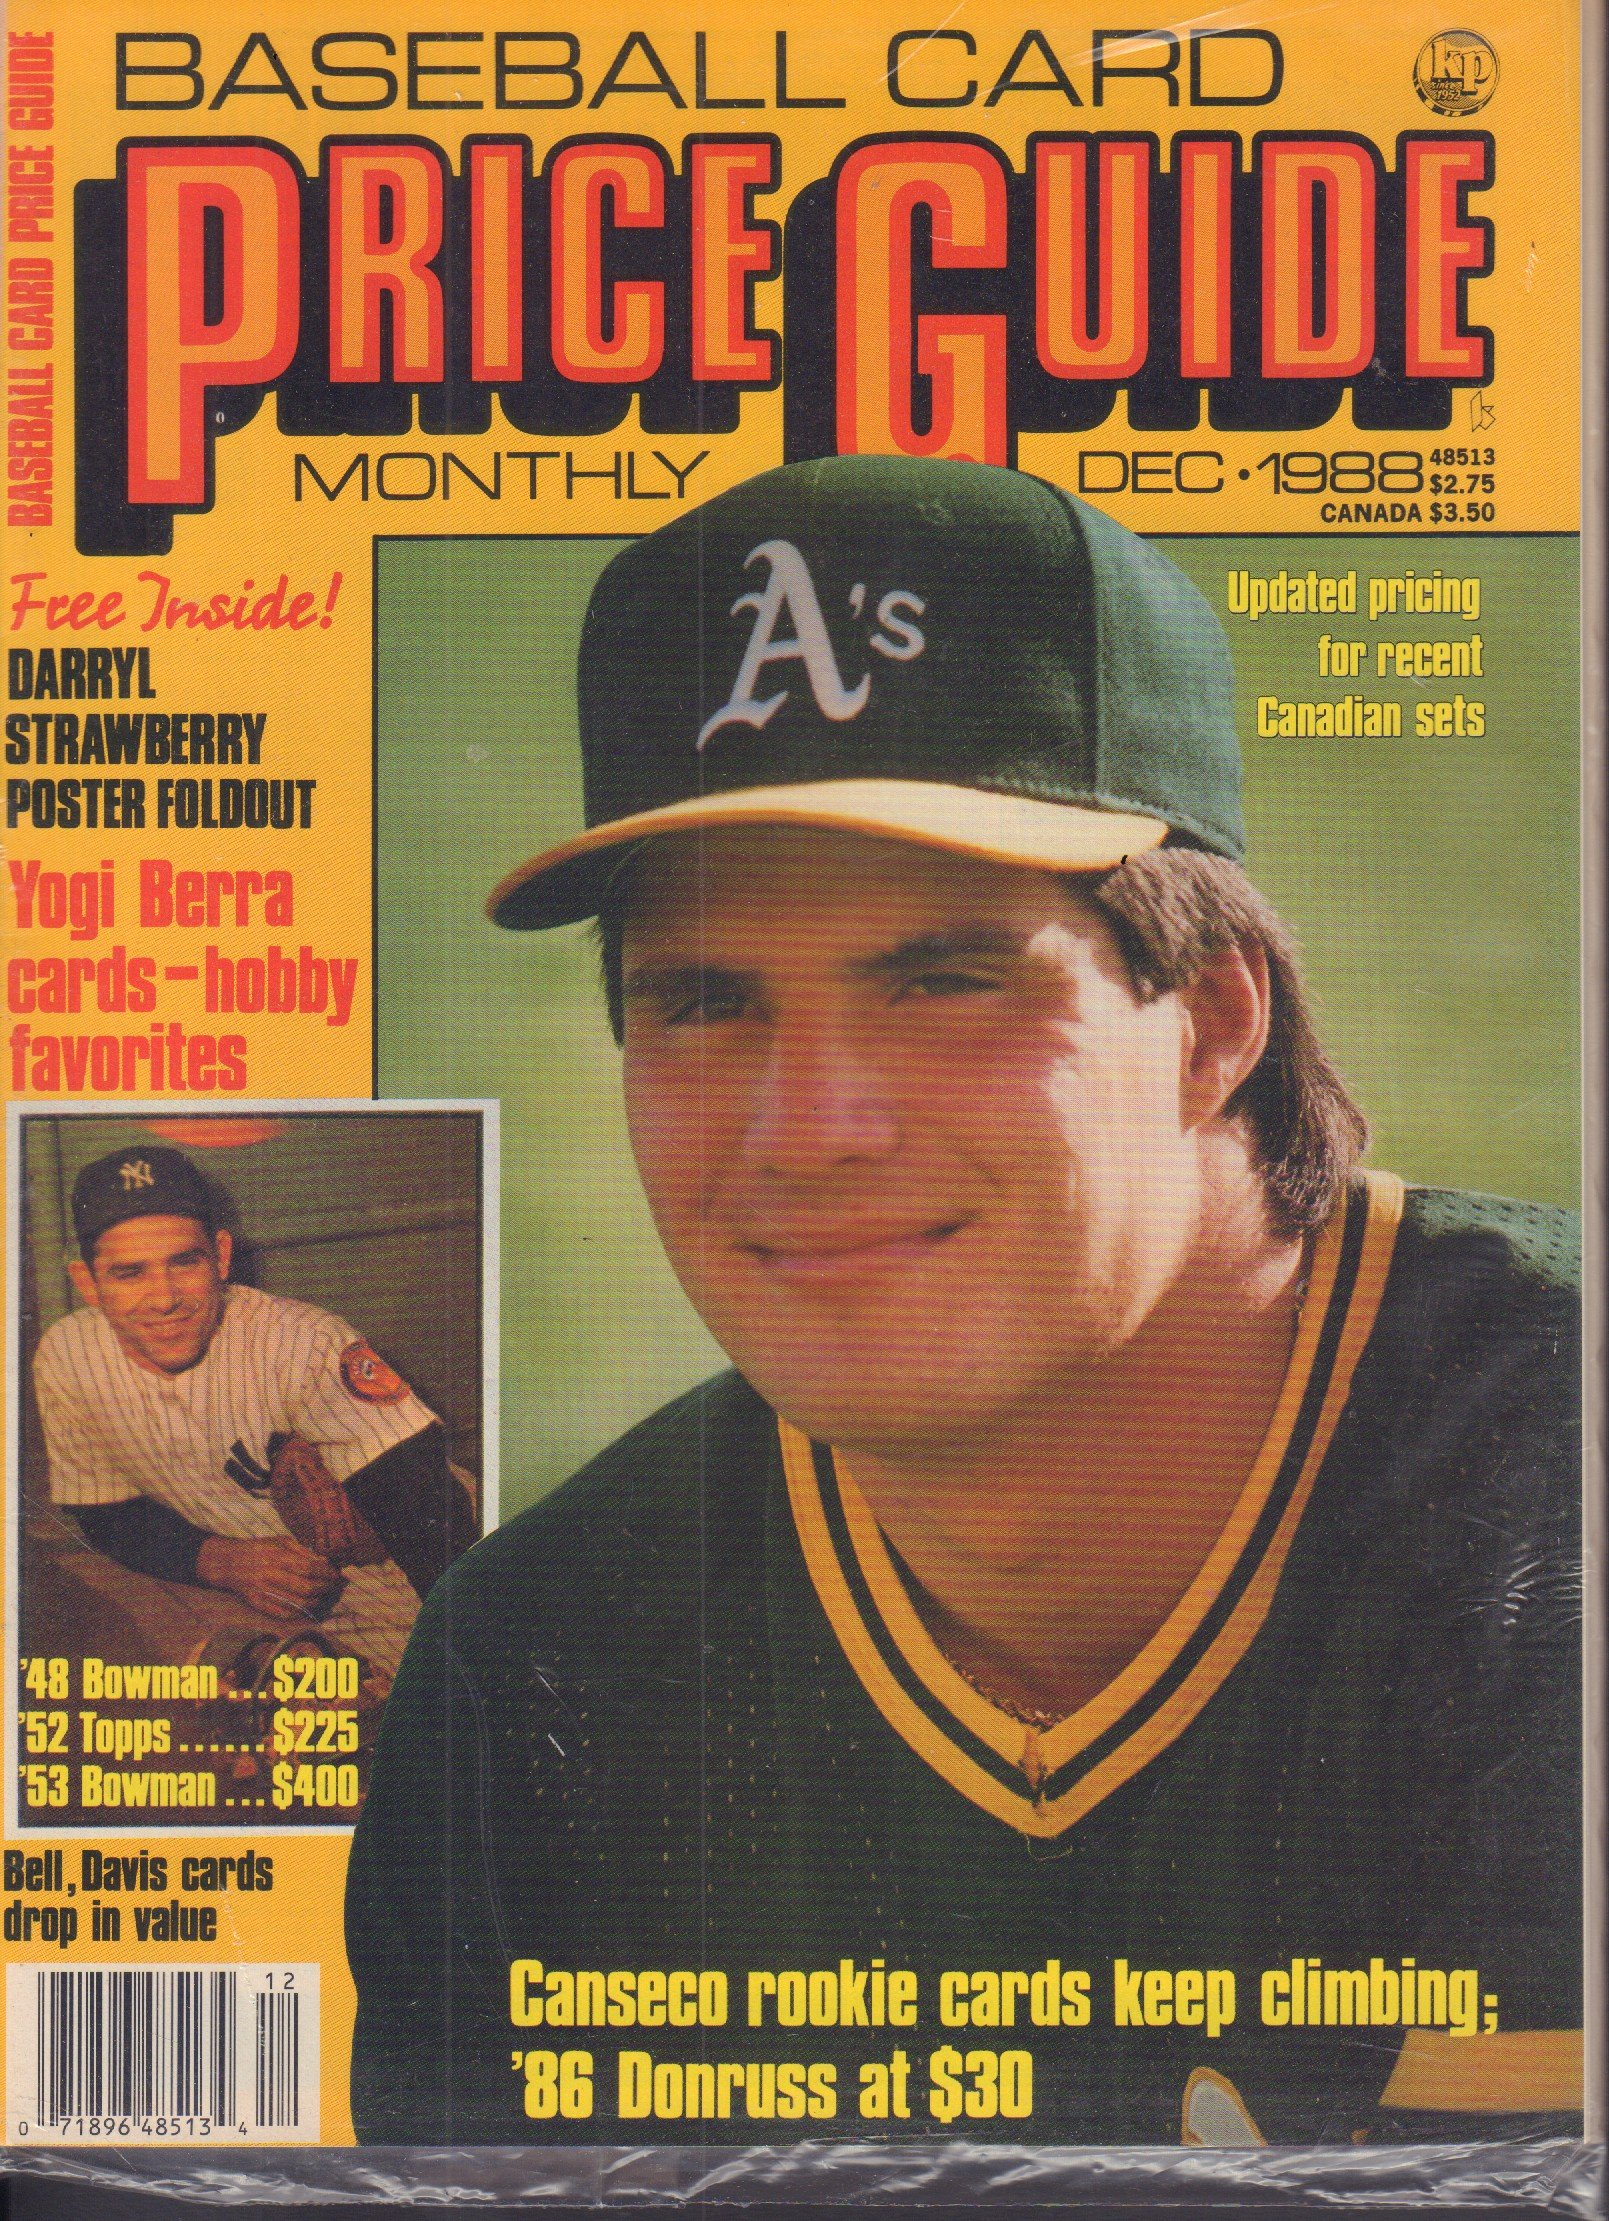 Baseball Card Price Guide December 1988 Darryl Strawberry